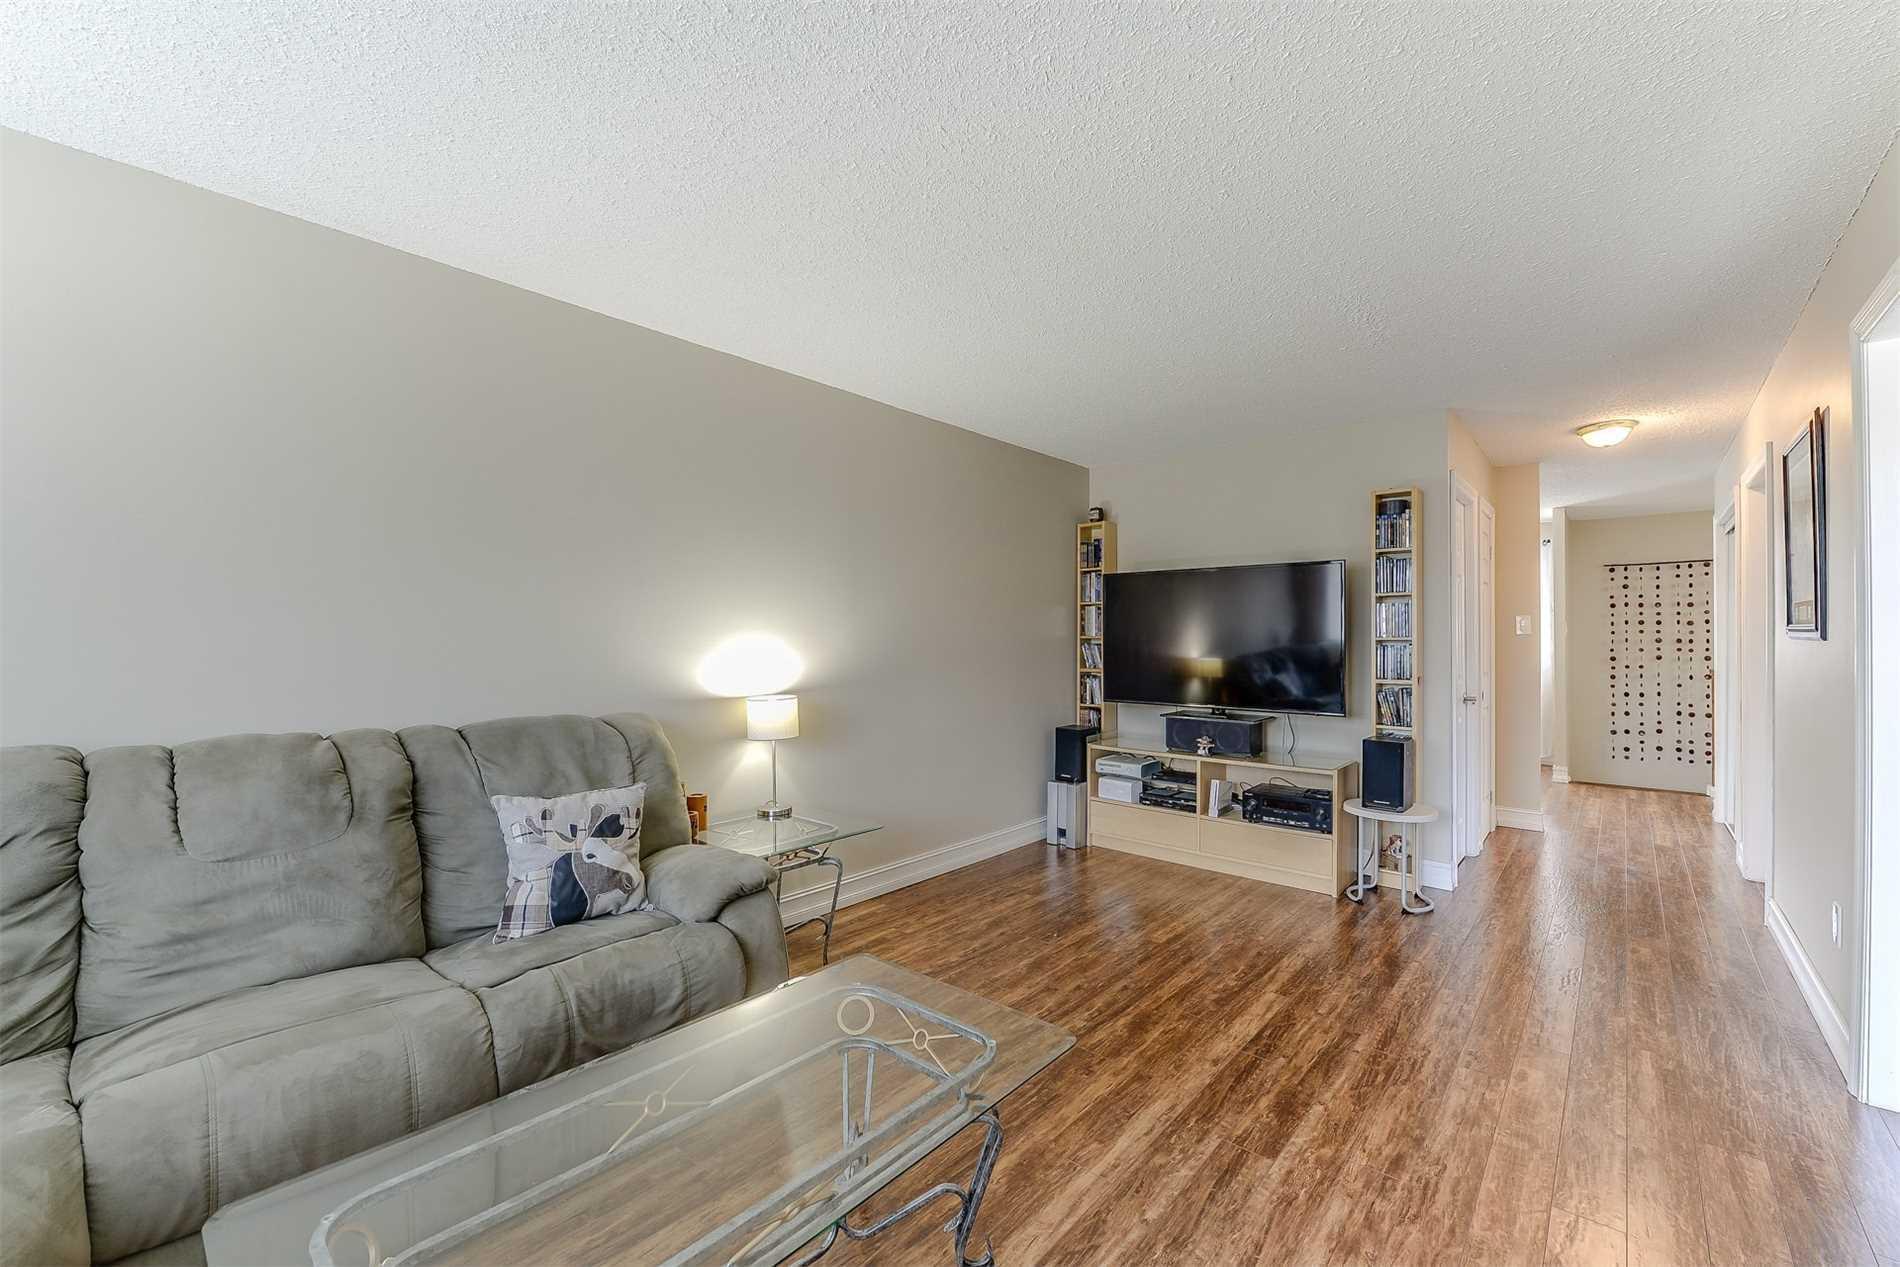 #130 - 2170 Bromsgrove Rd, Mississauga W4427322